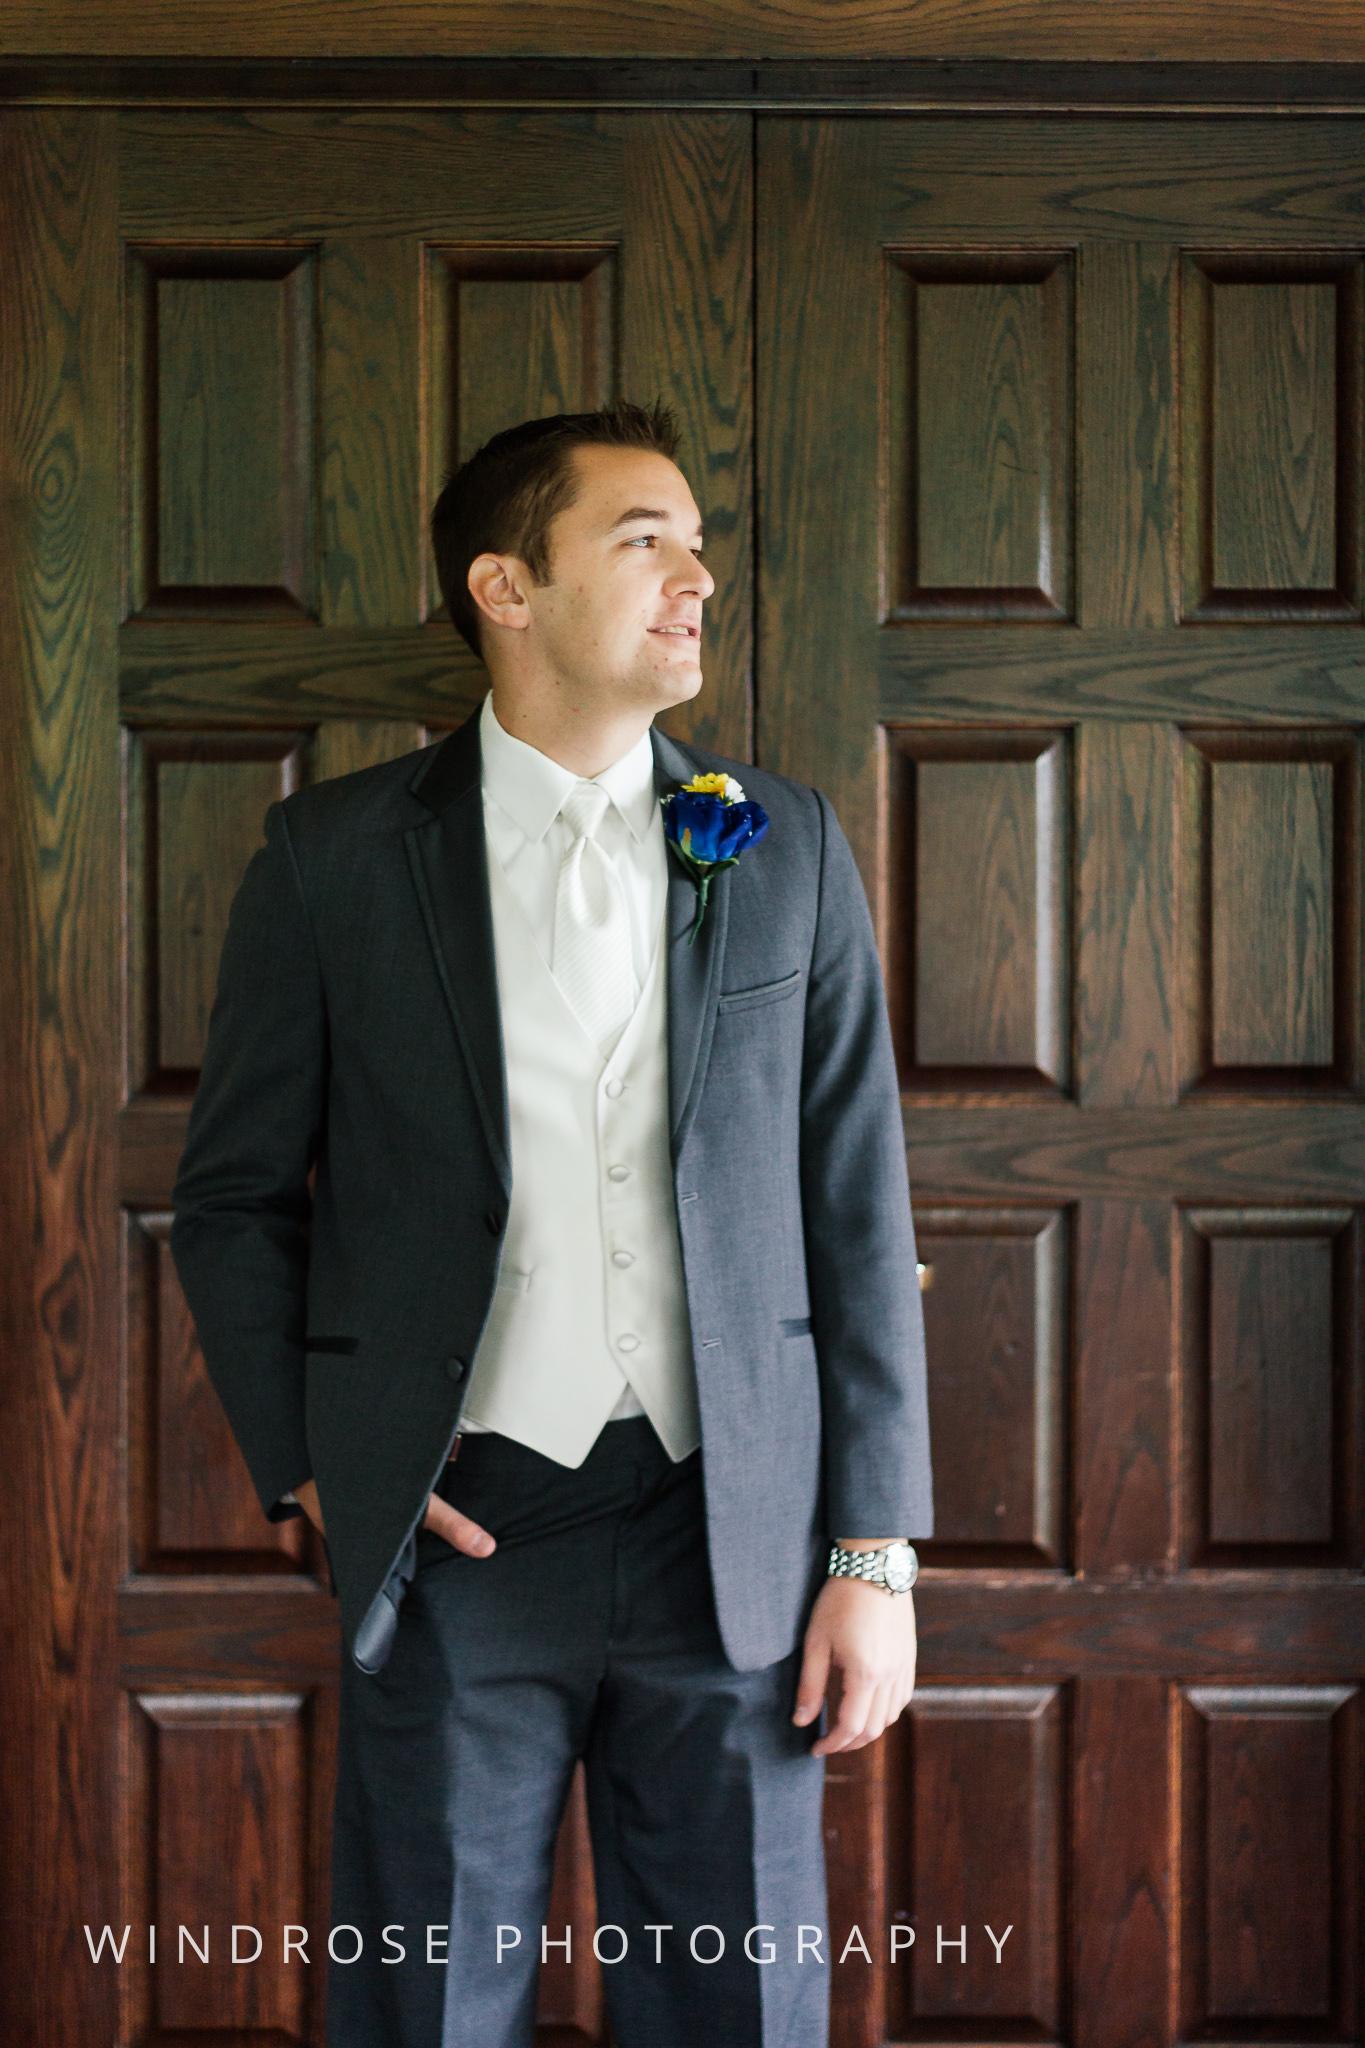 La-Crosse-Country-Club-Wedding-Minnesota-Wedding-Photographer-1.jpg